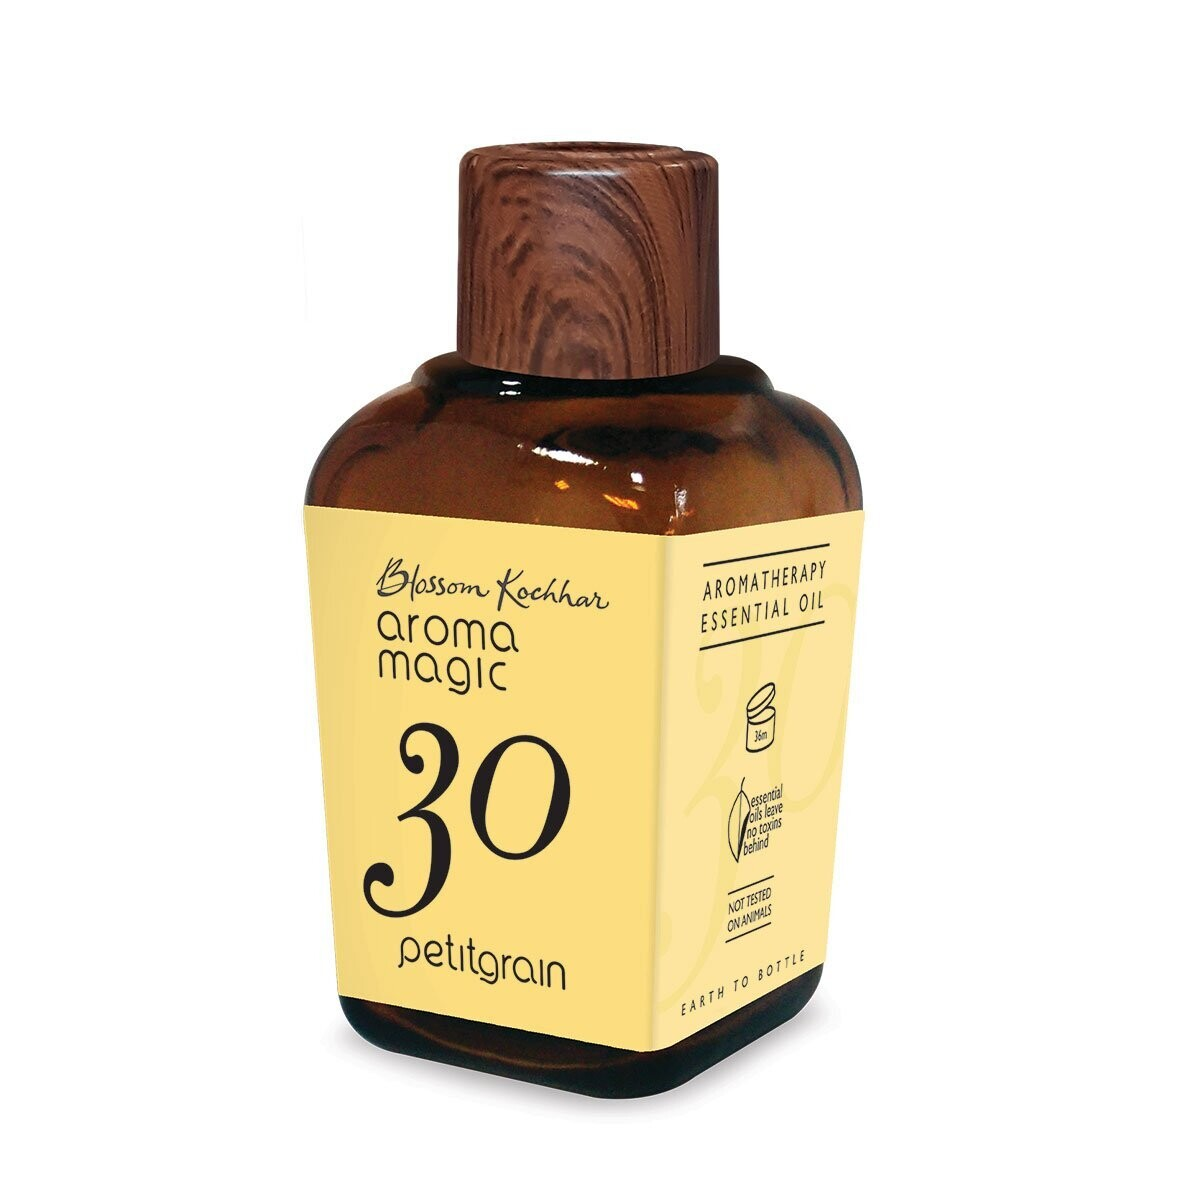 Aroma Magic 30 Petitgrain Oil 20 Ml